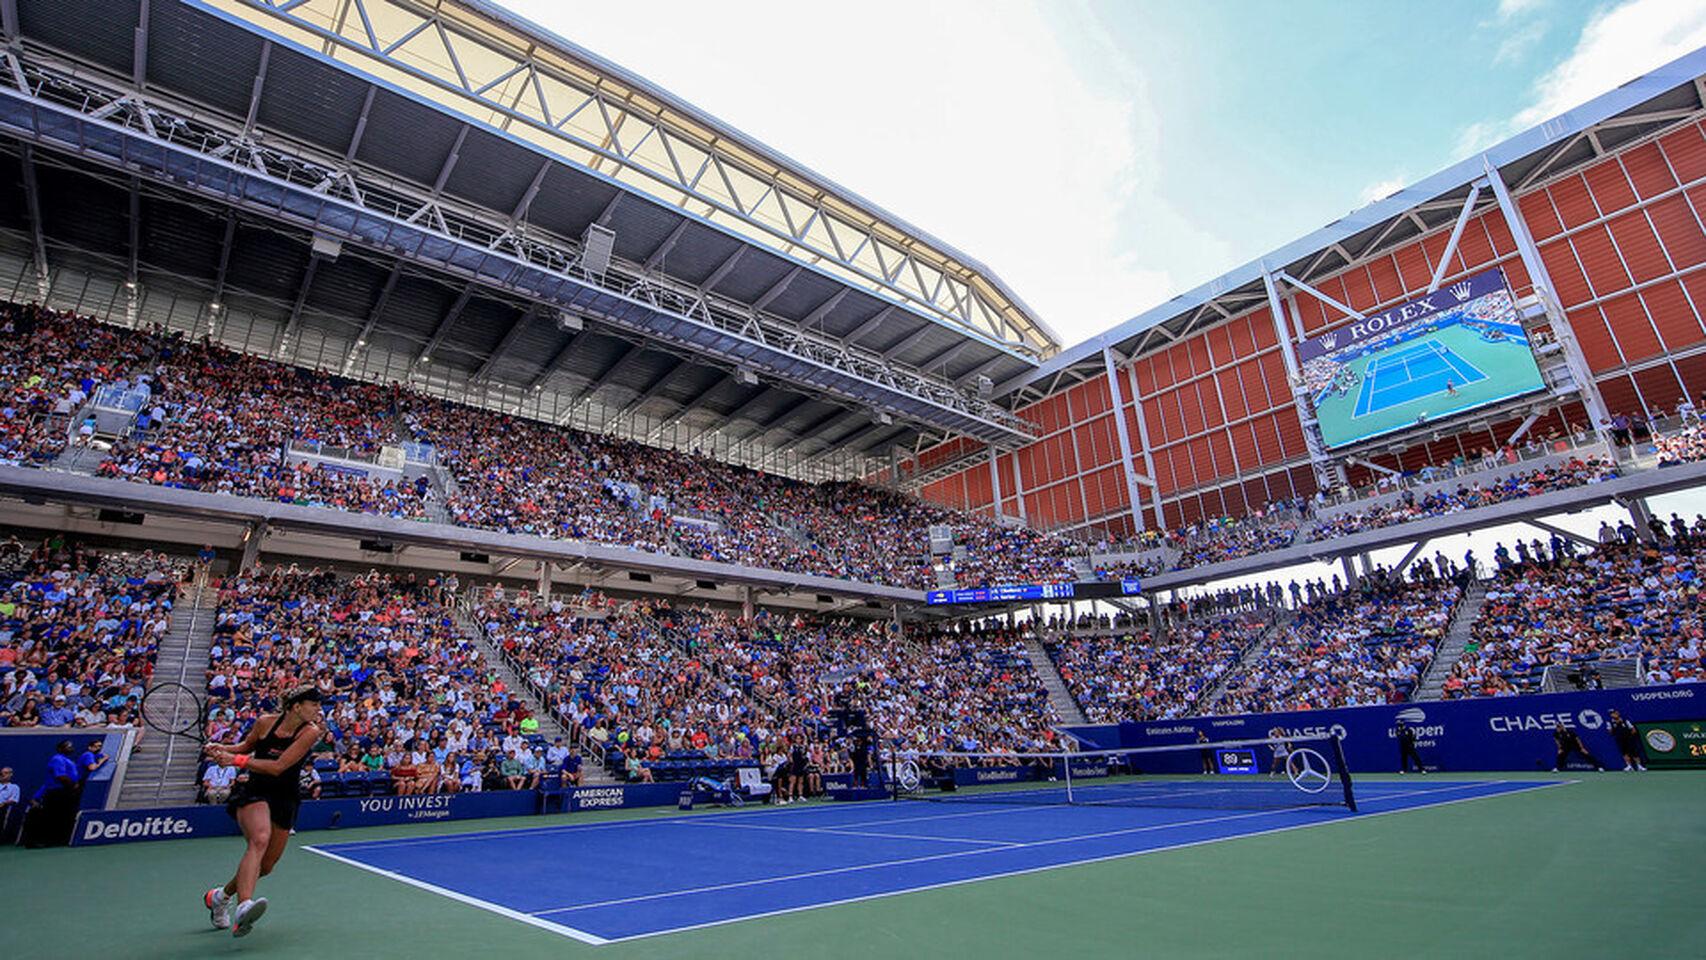 deportes-tenis-tenistas-ranking_atp-ranking_wta-us_open-tenis_424219542_133017524_1706x960